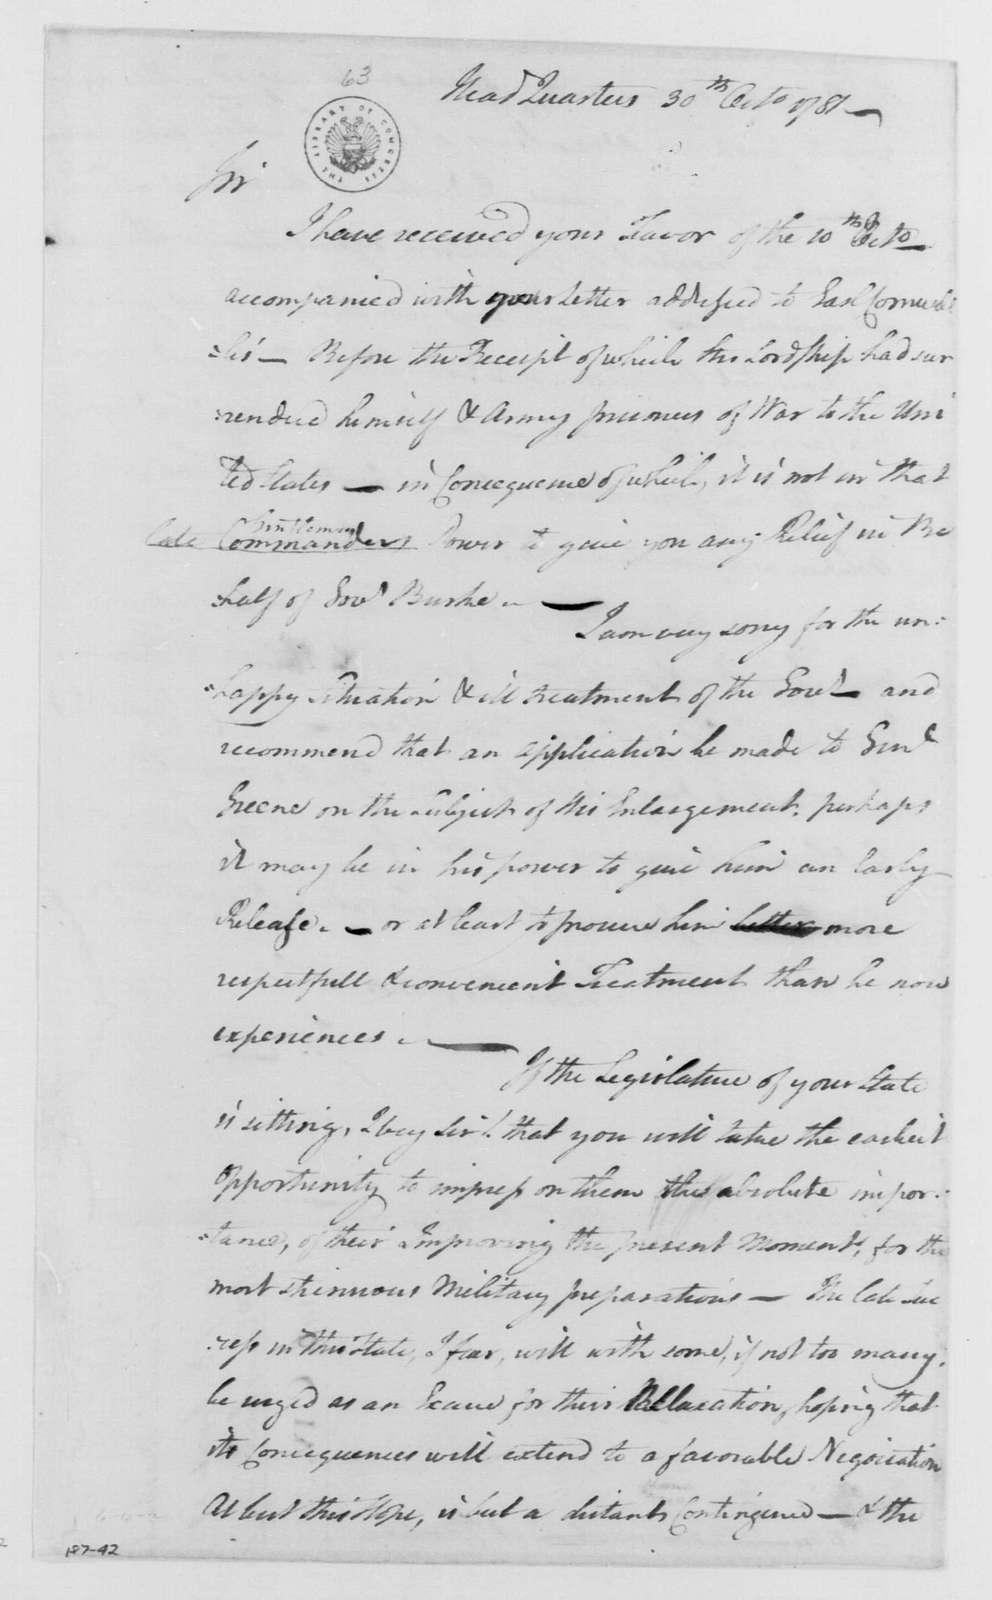 George Washington Papers, Series 4, General Correspondence: George Washington to Alexander Martin, October 30, 1781